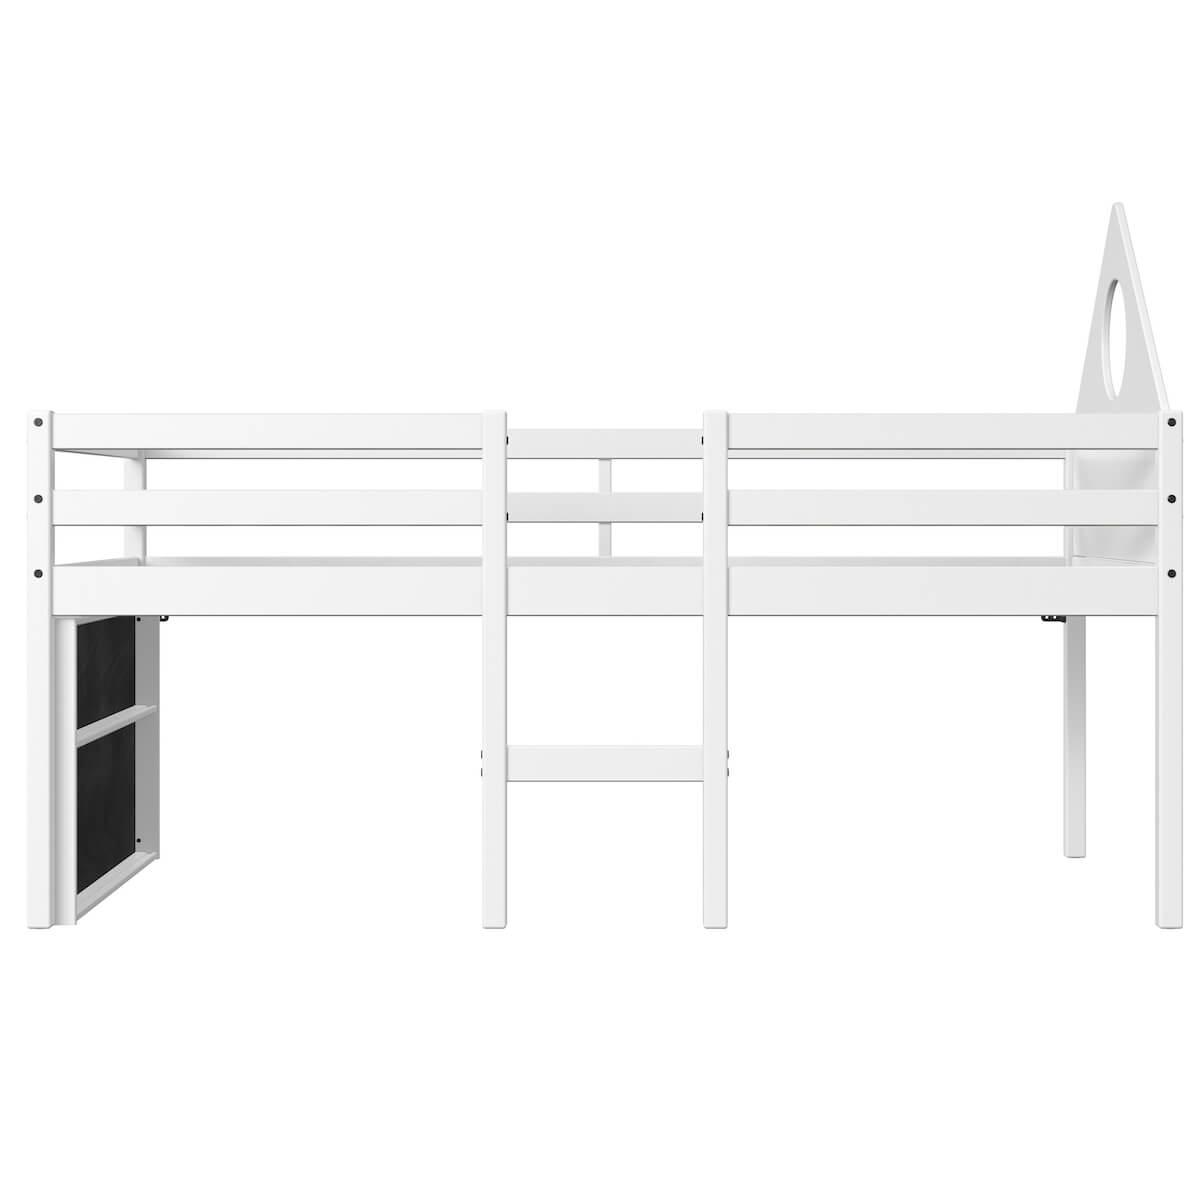 Cama media alta 90x200cm cabecera-pizarra ALFRED Flexa blanco